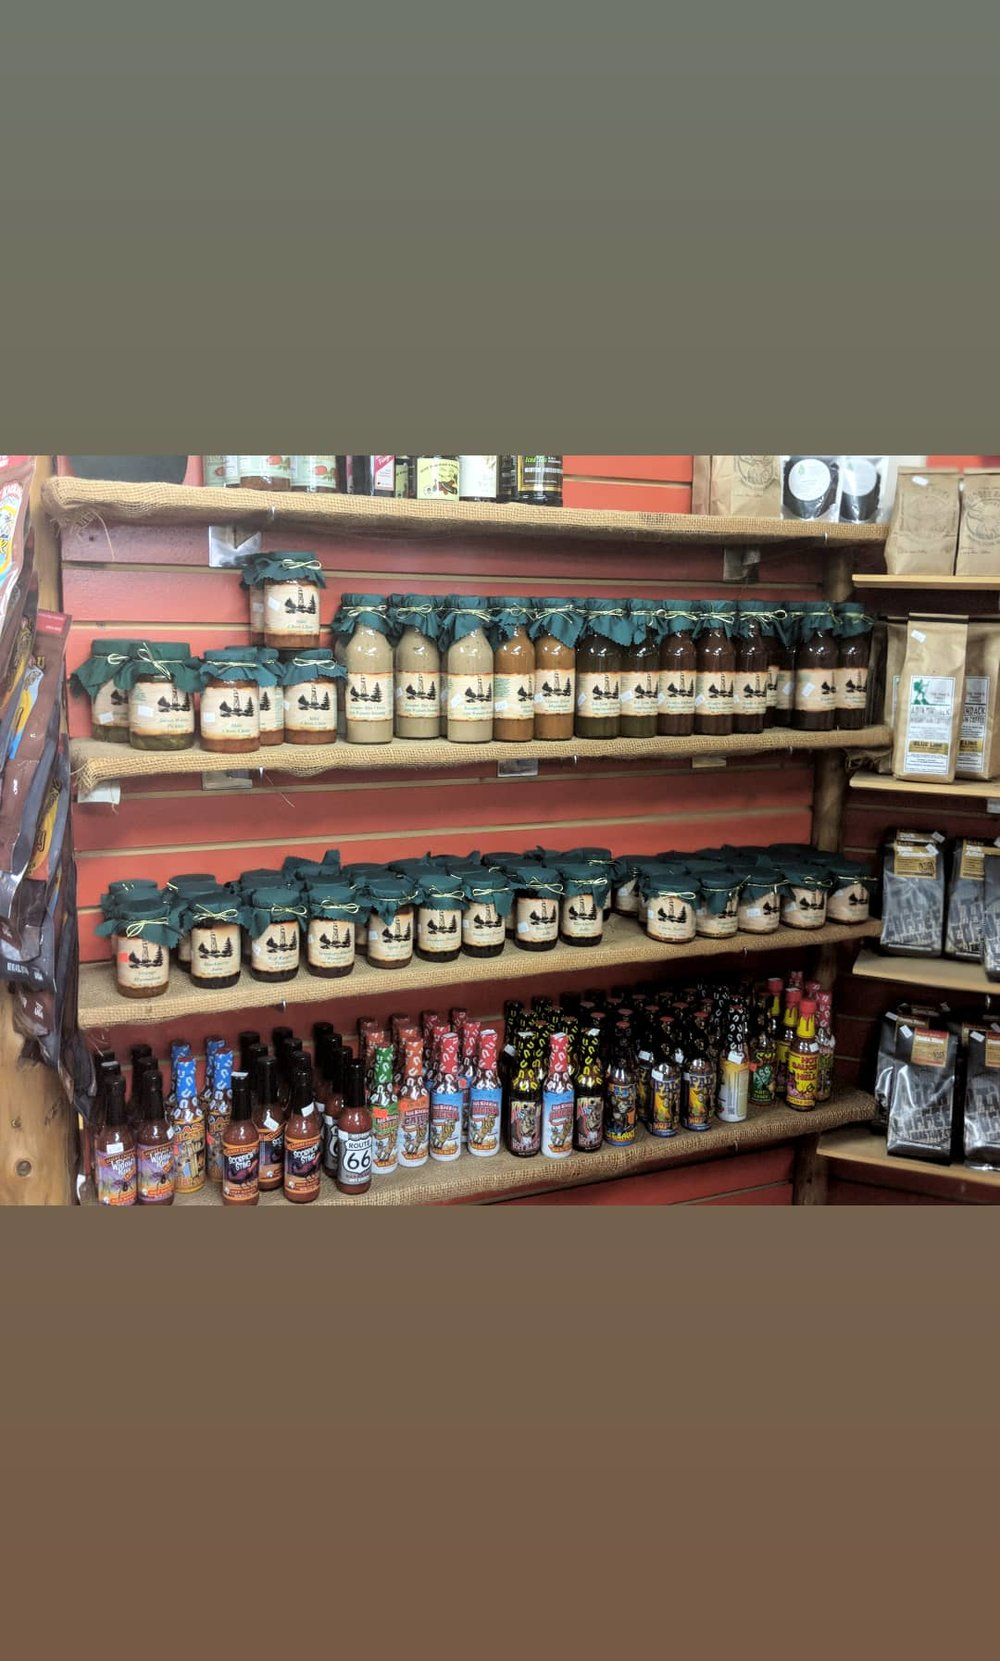 Jams, sauces, and coffee!